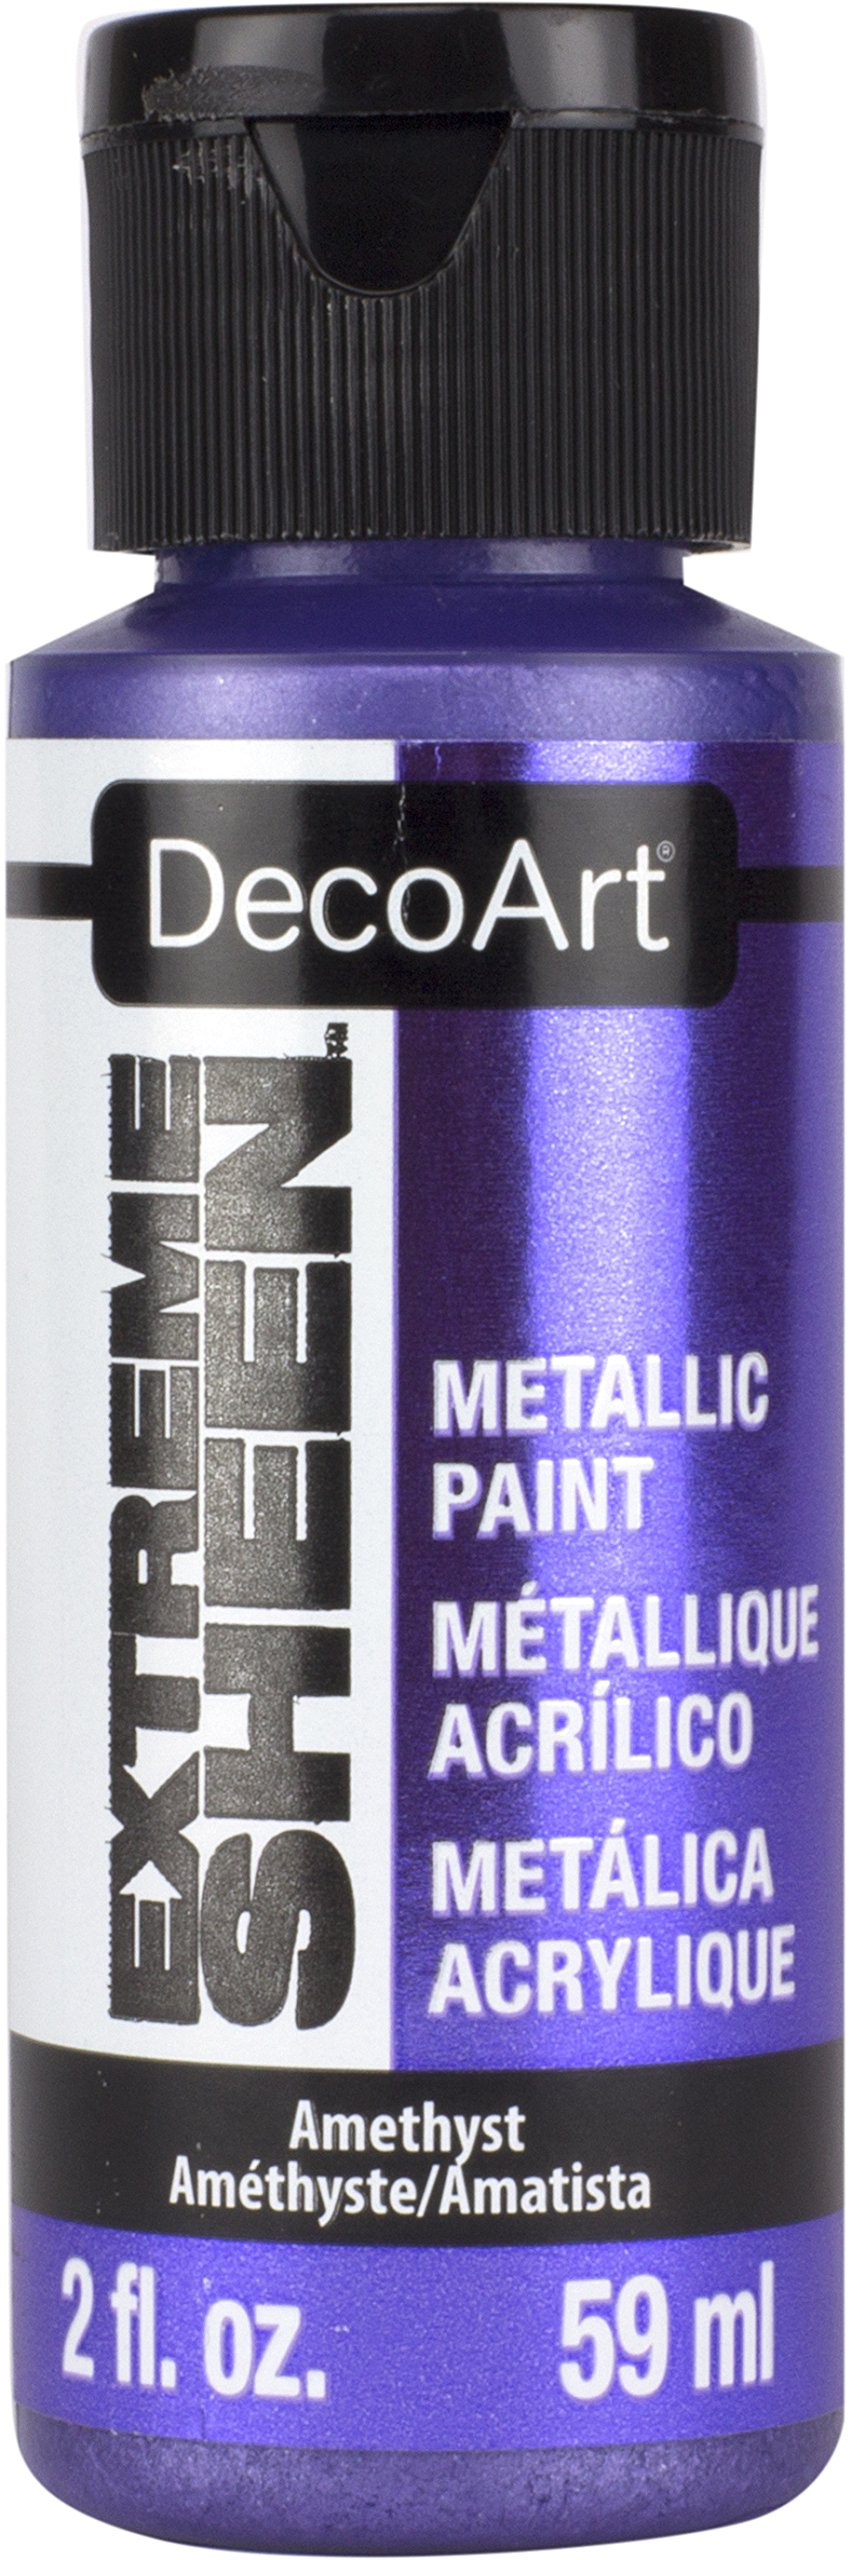 DecoArt 2 Ounce, Amethyst Extreme Sheen Paint